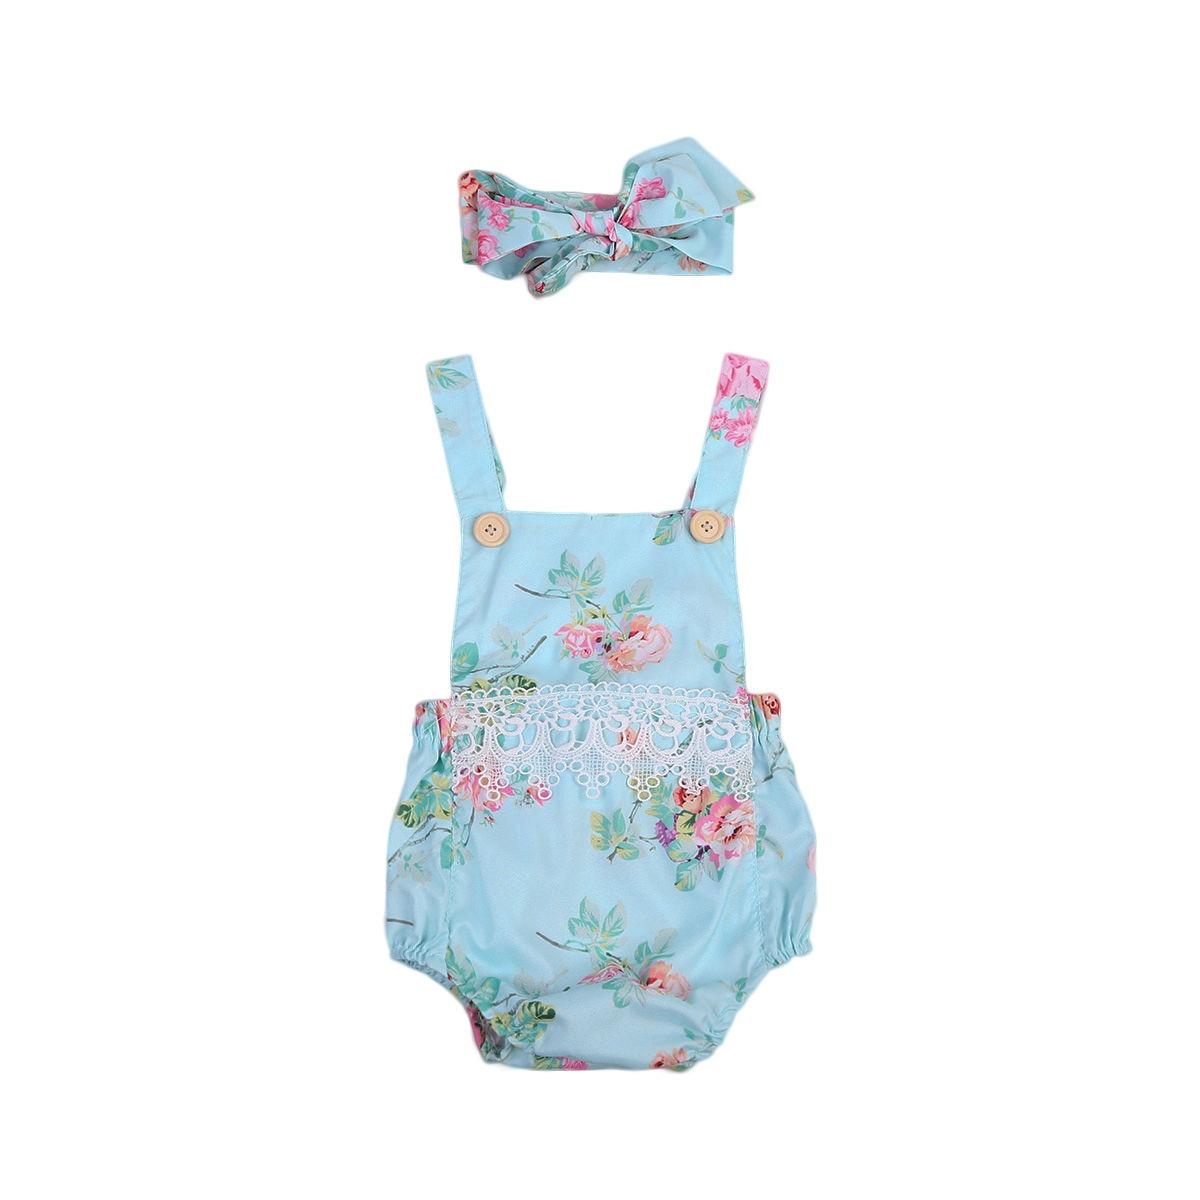 2pcs Adorable Rompers Summer Newborn Baby Girl Lace Romper Cute Headband Floral Jumper Jumpsuit Infantil Girls Outfit Sunsuit